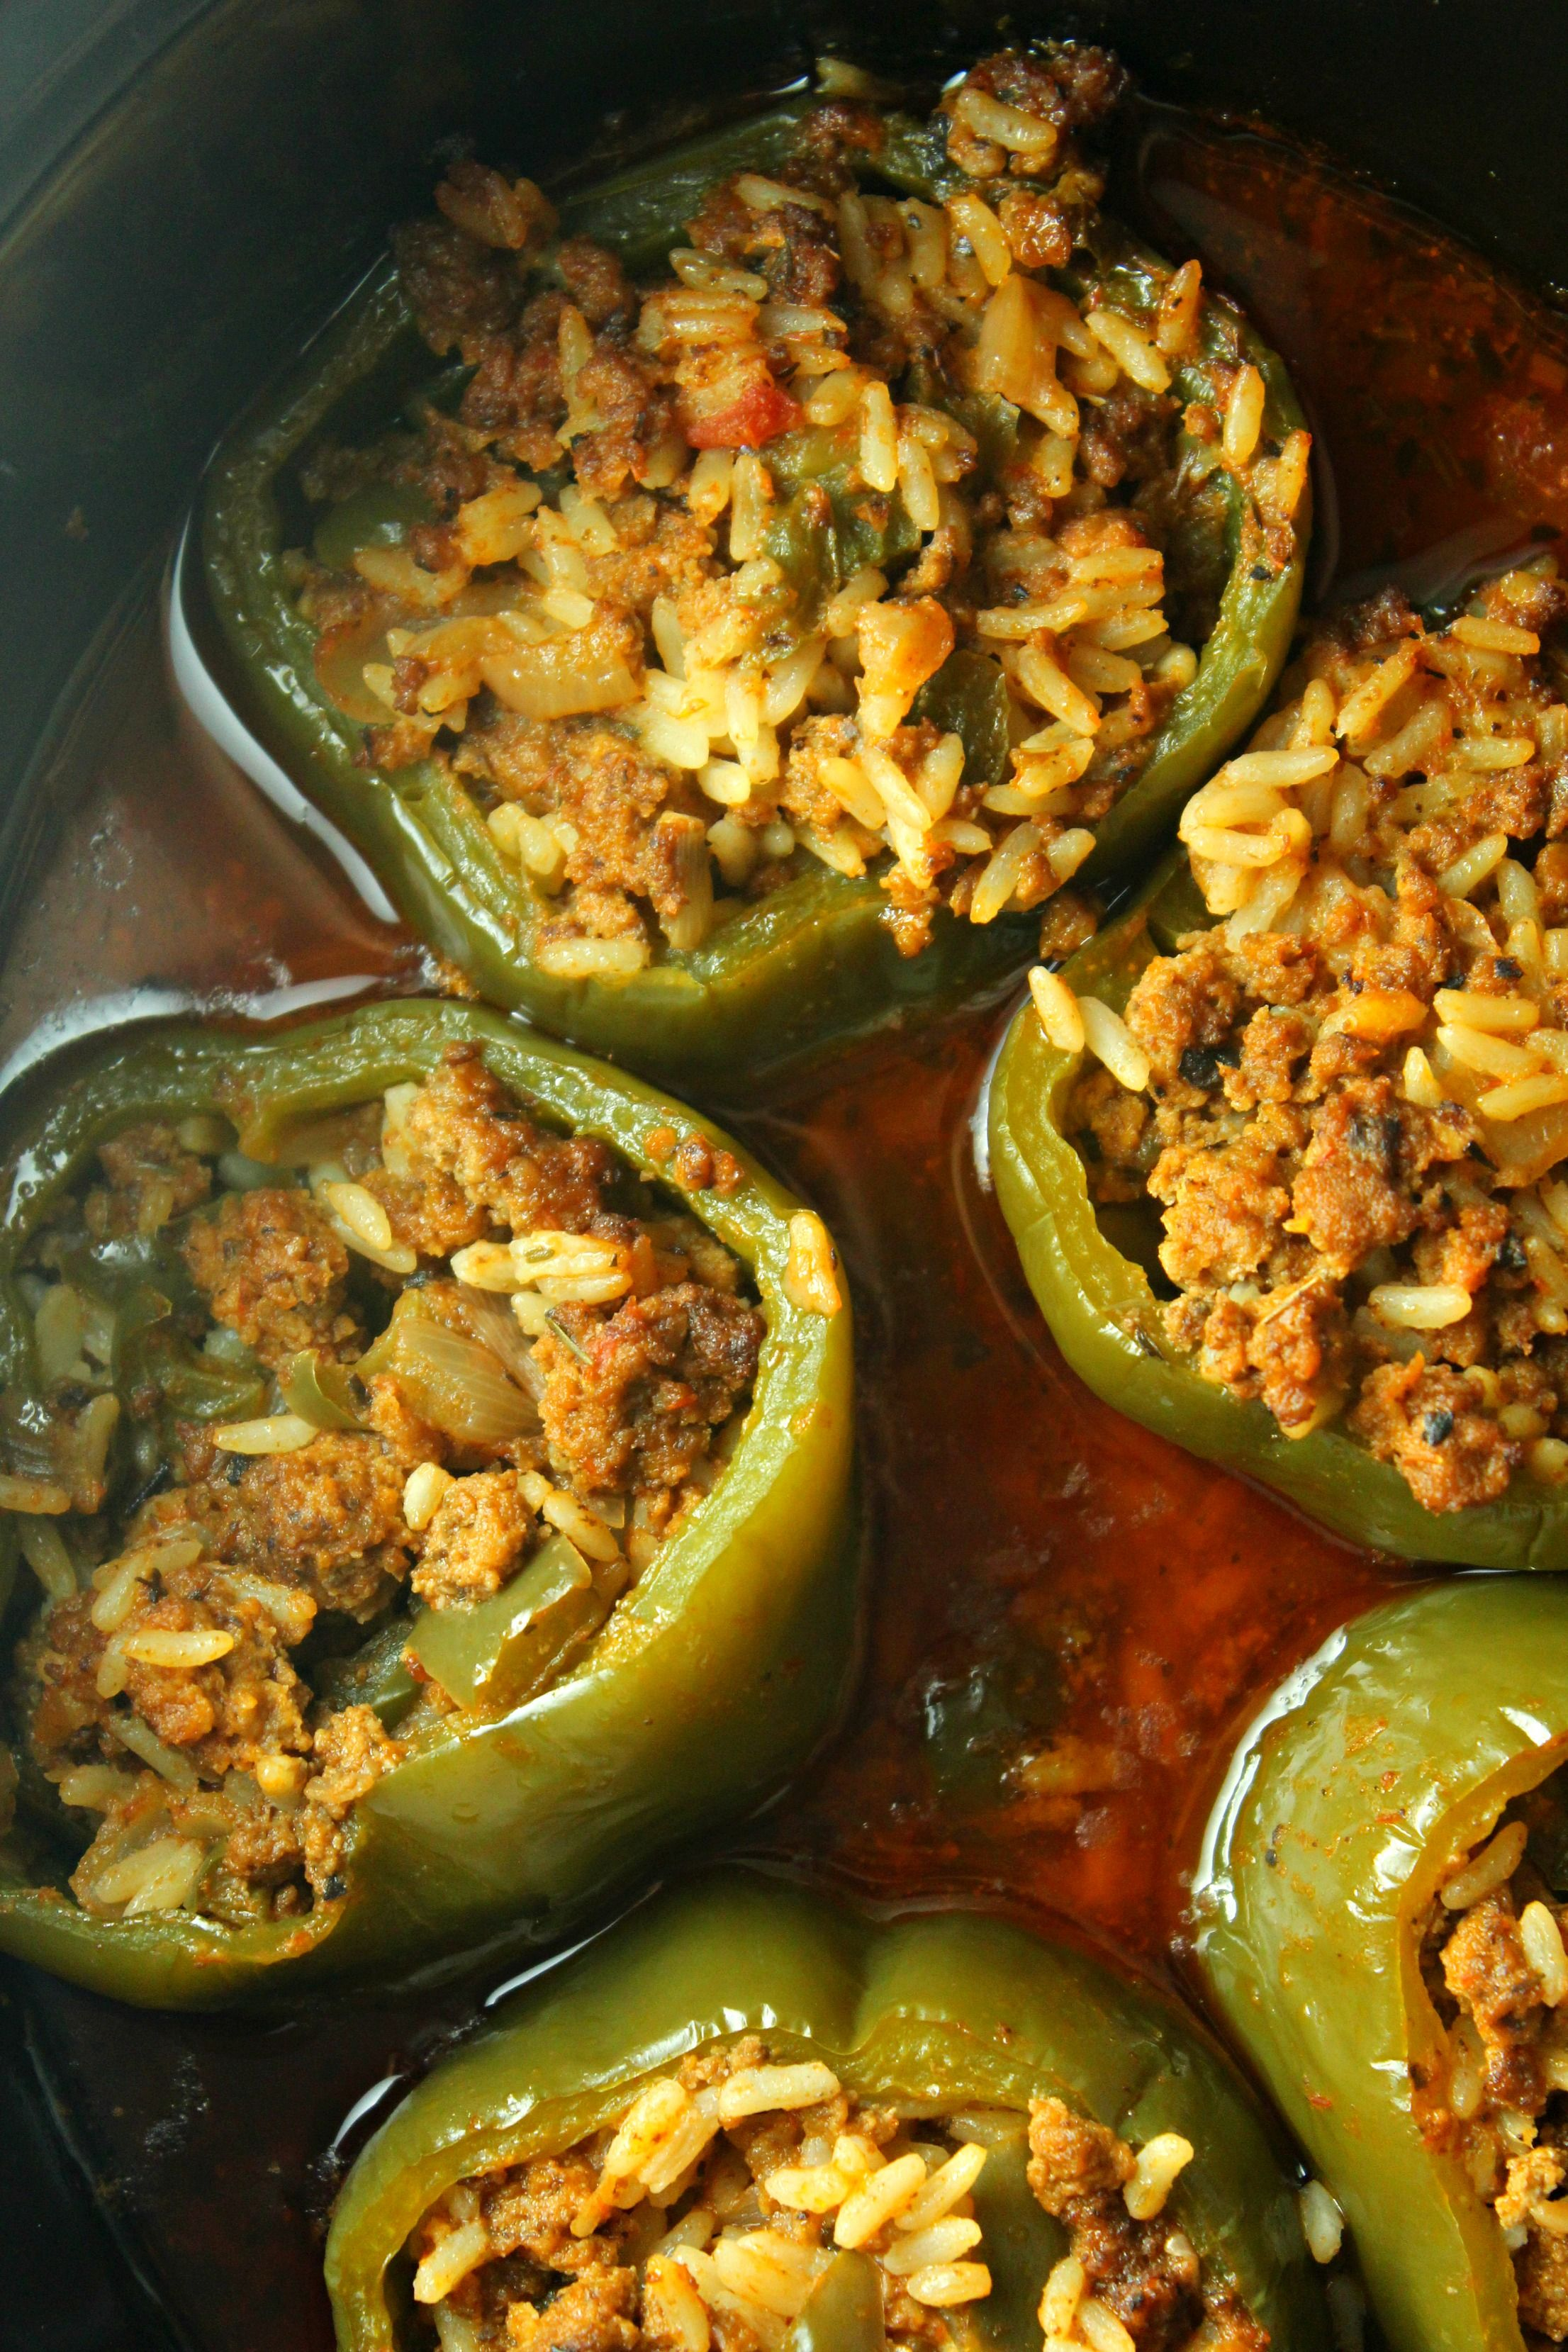 Slow Cooker Stuffed Peppers Recipe Stuffed Peppers Slow Cooker Stuffed Peppers Recipes